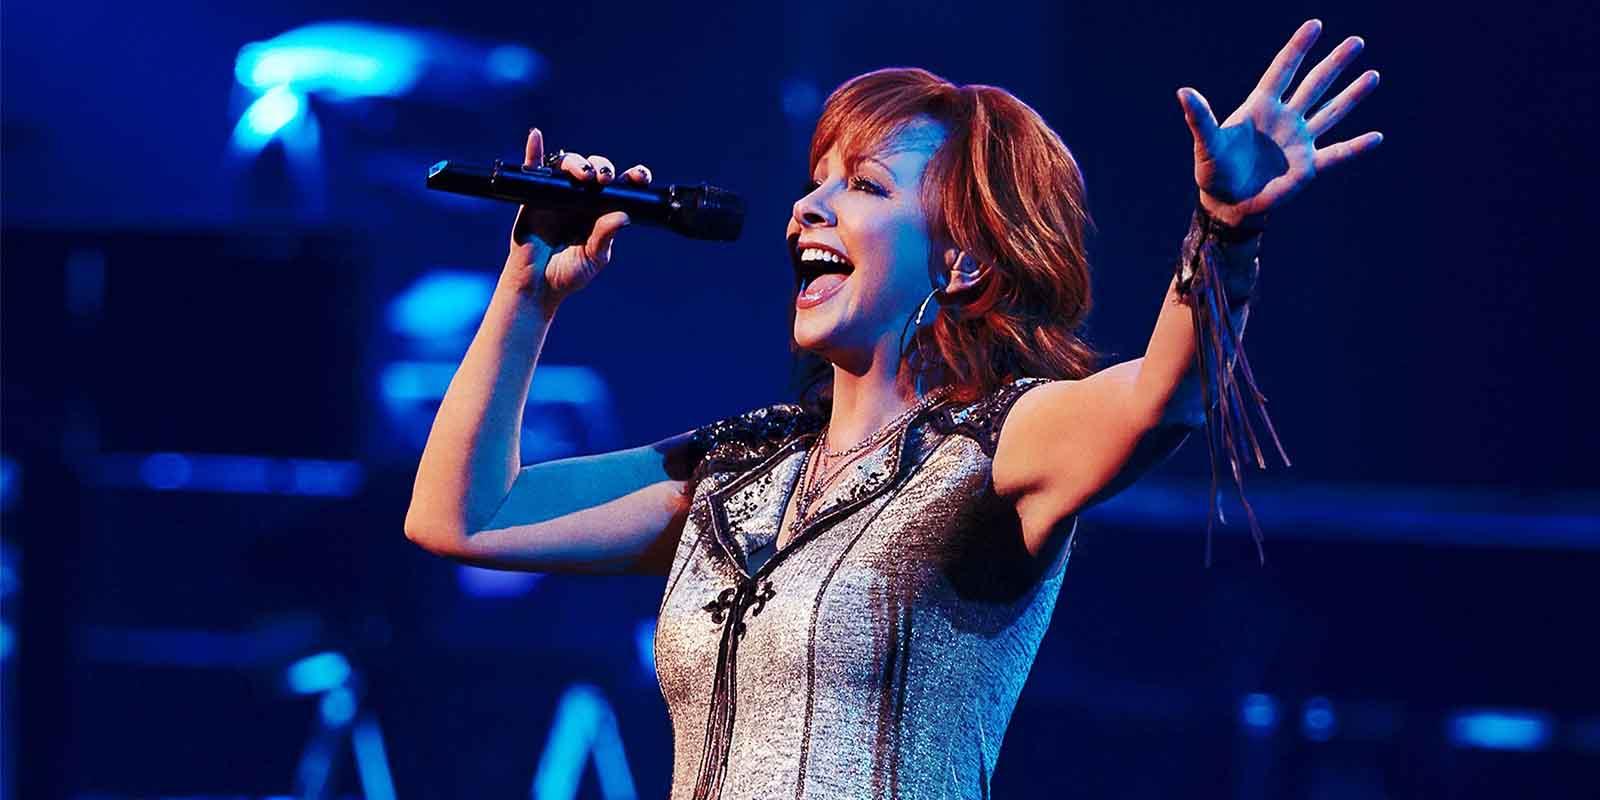 Reba Mcentire singing on stage 2019